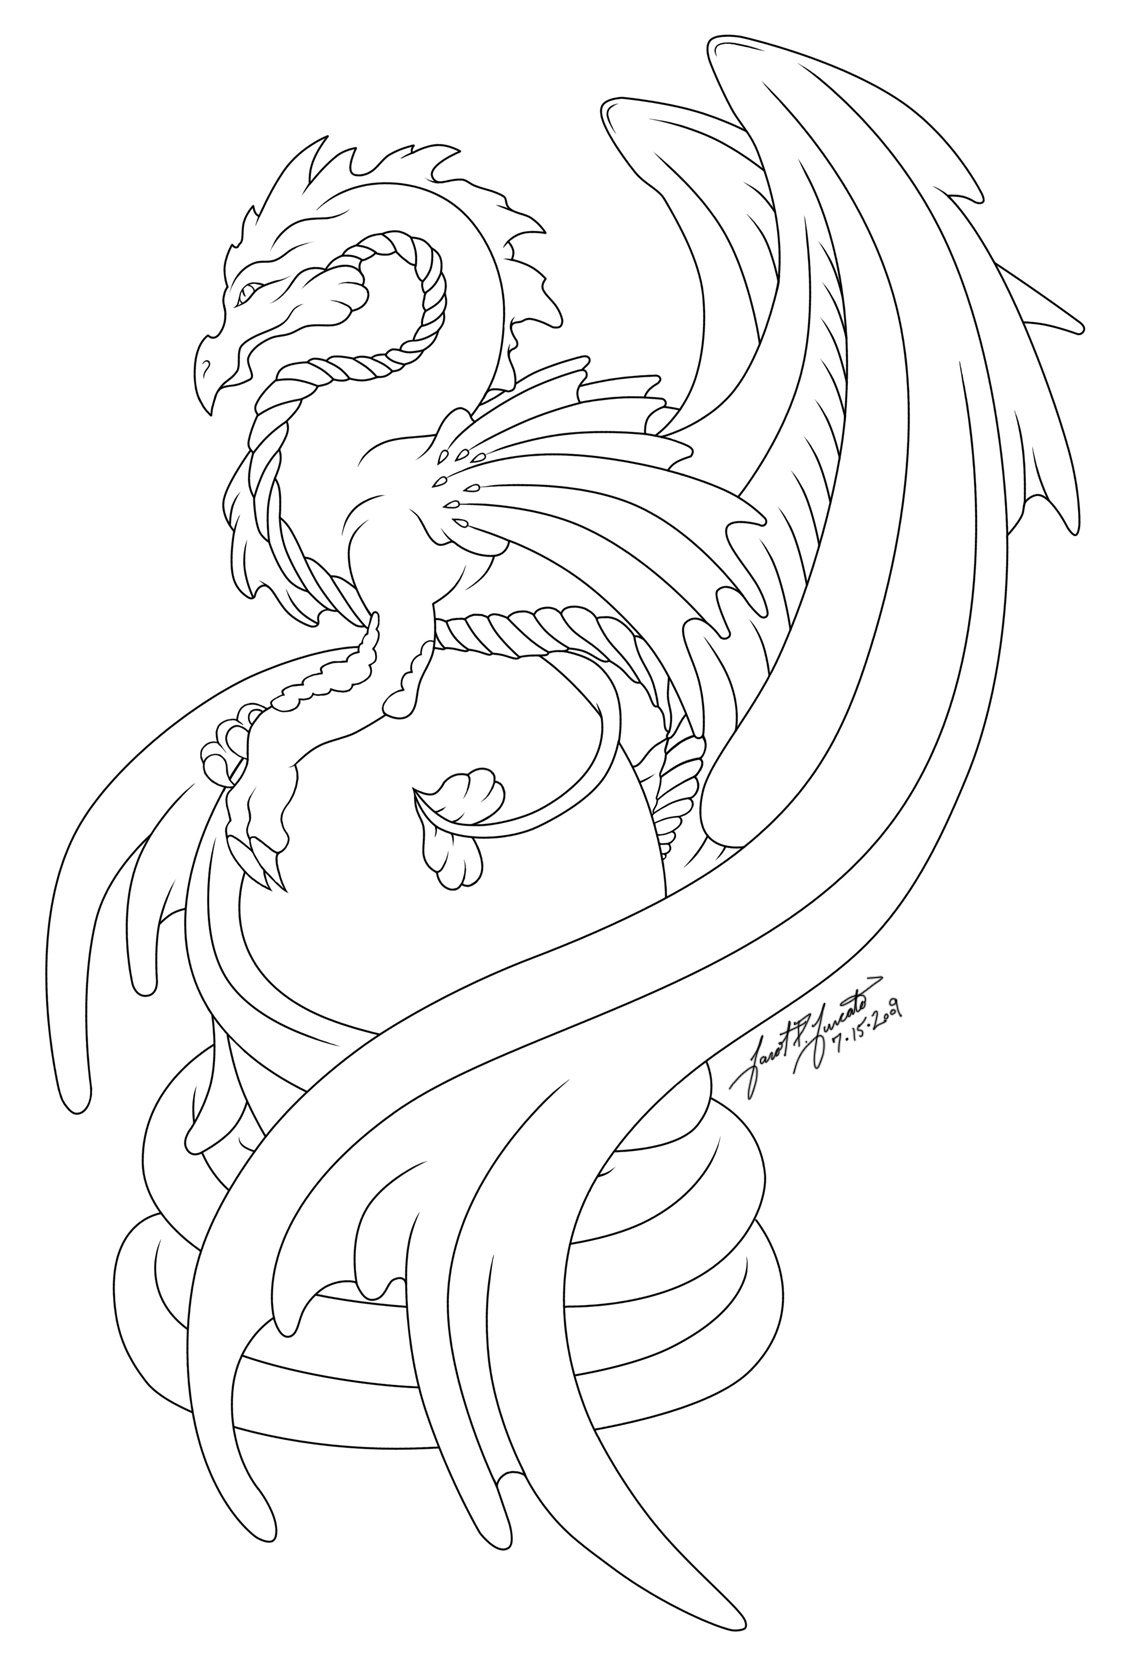 Dragons Egg Line Art By PulseDragon On DeviantArt